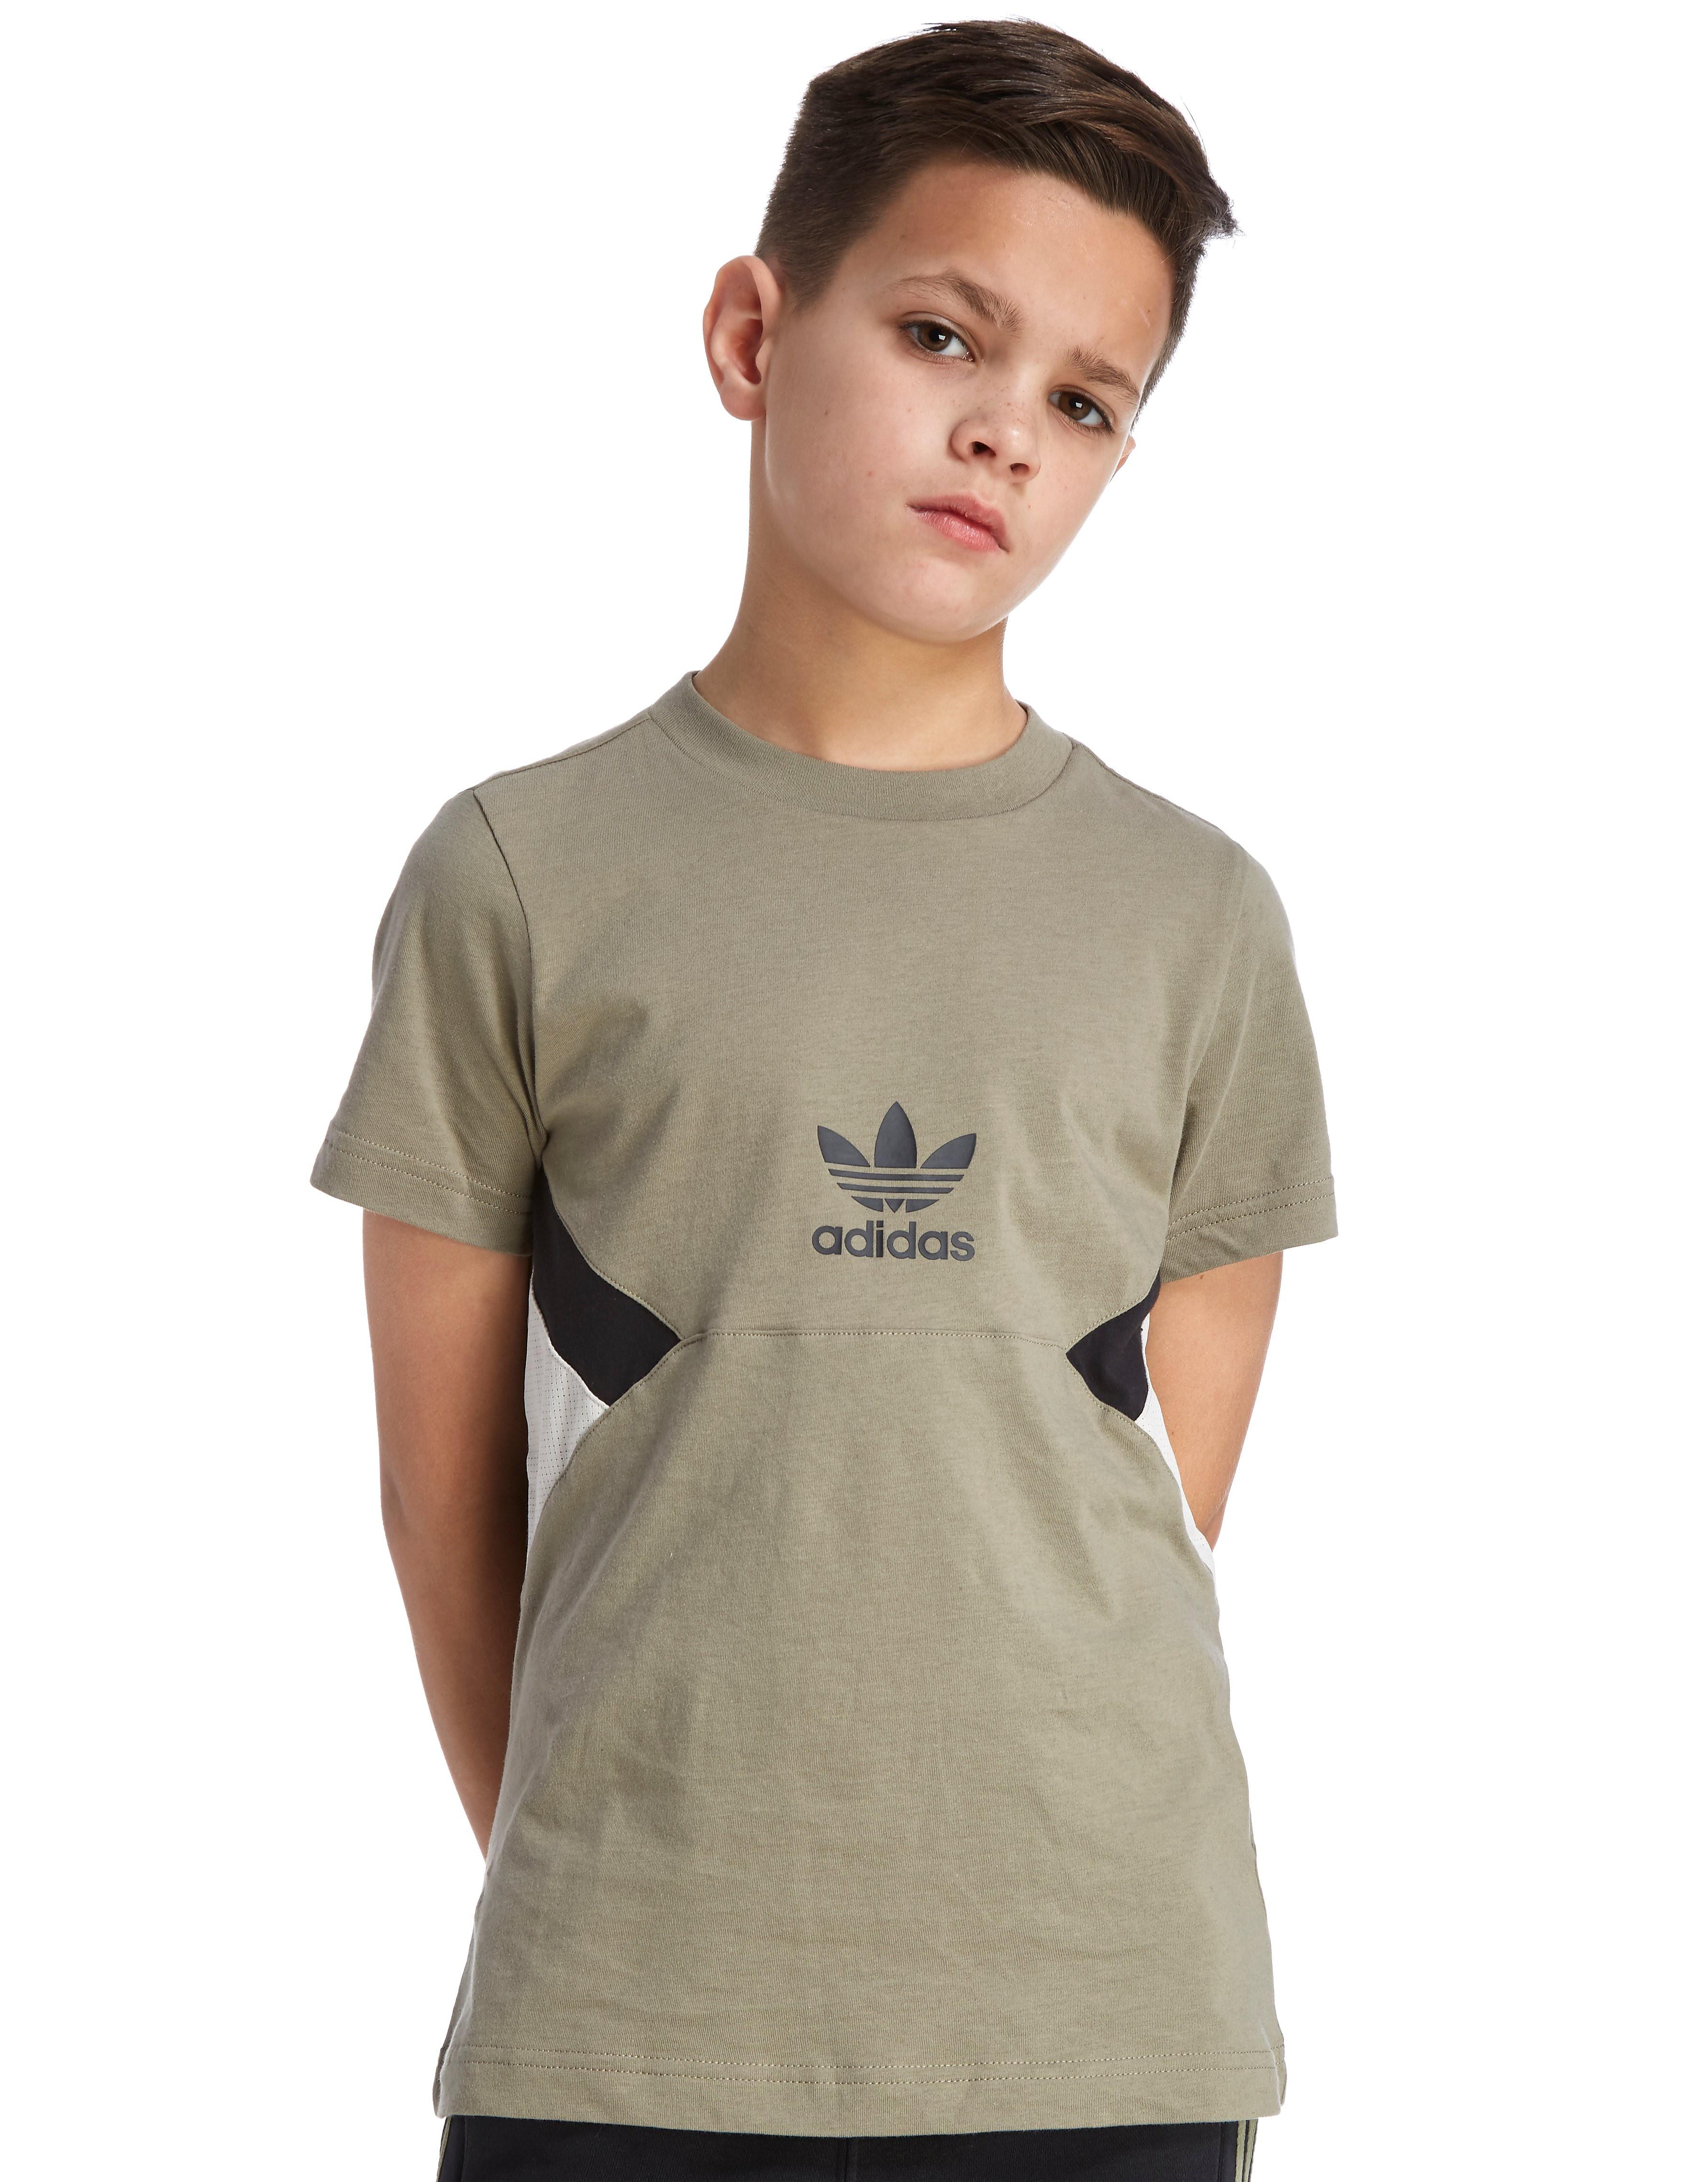 adidas Originals Europe T-Shirt Junior